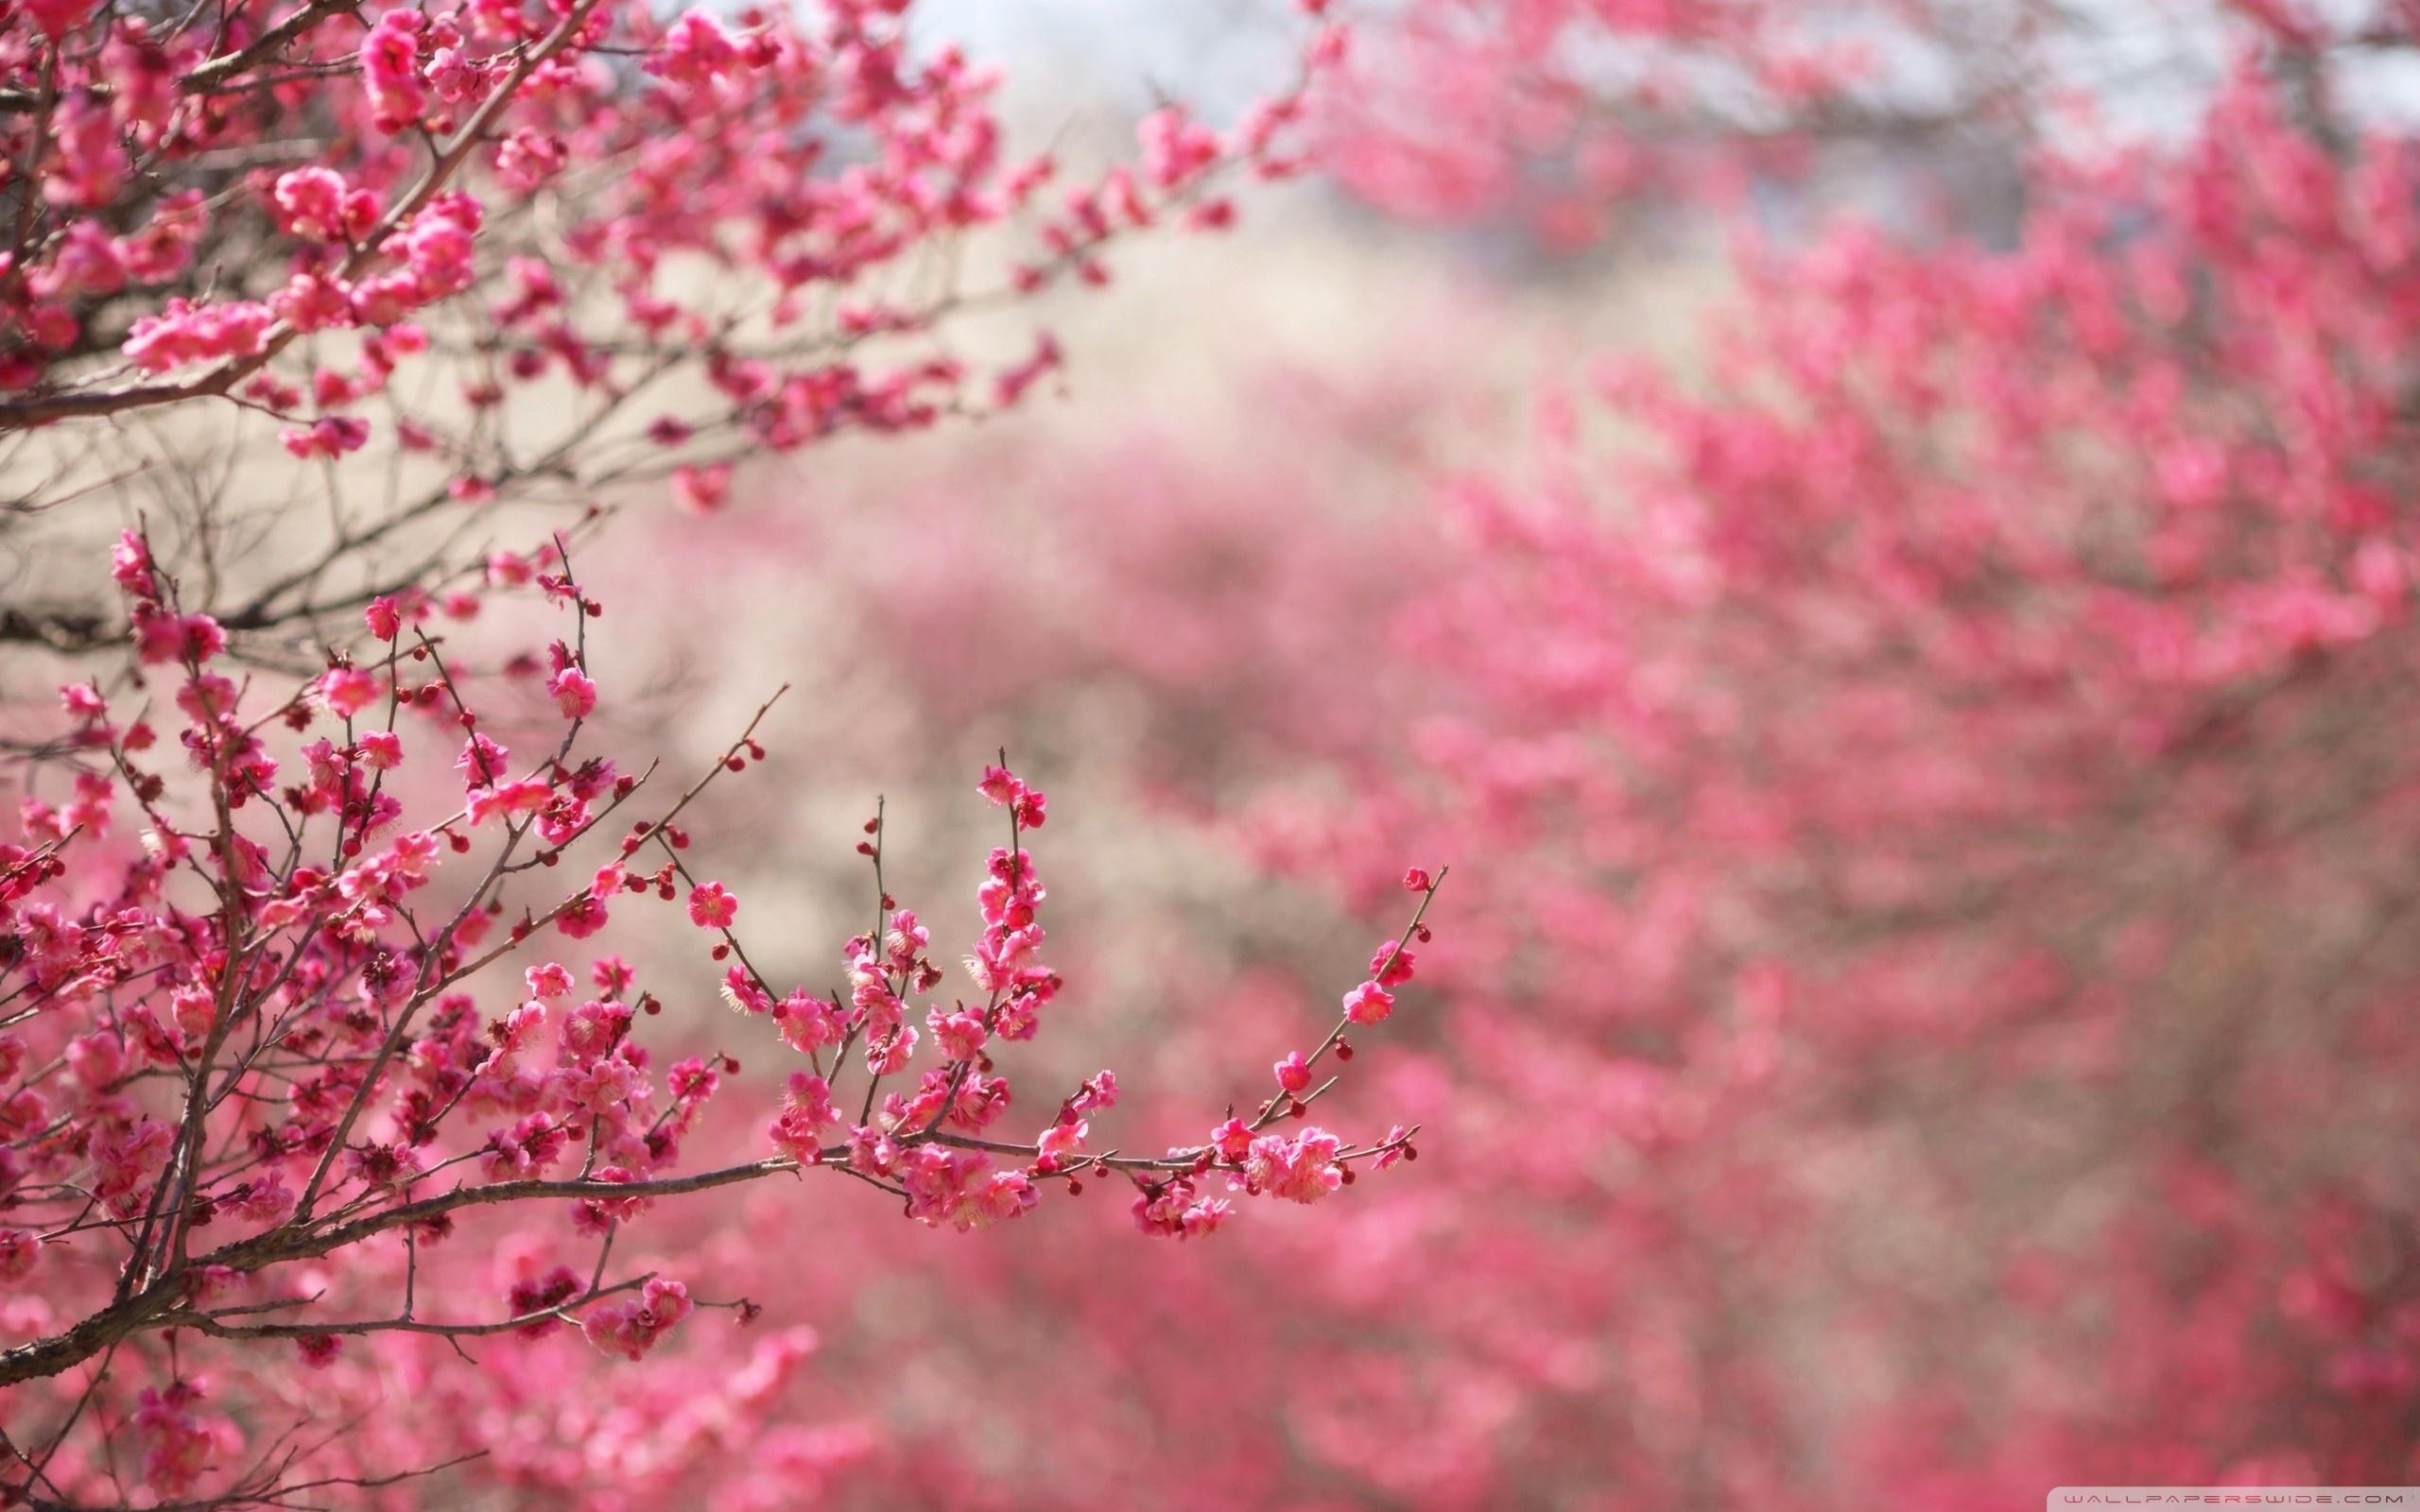 Blossom Wallpaper HD